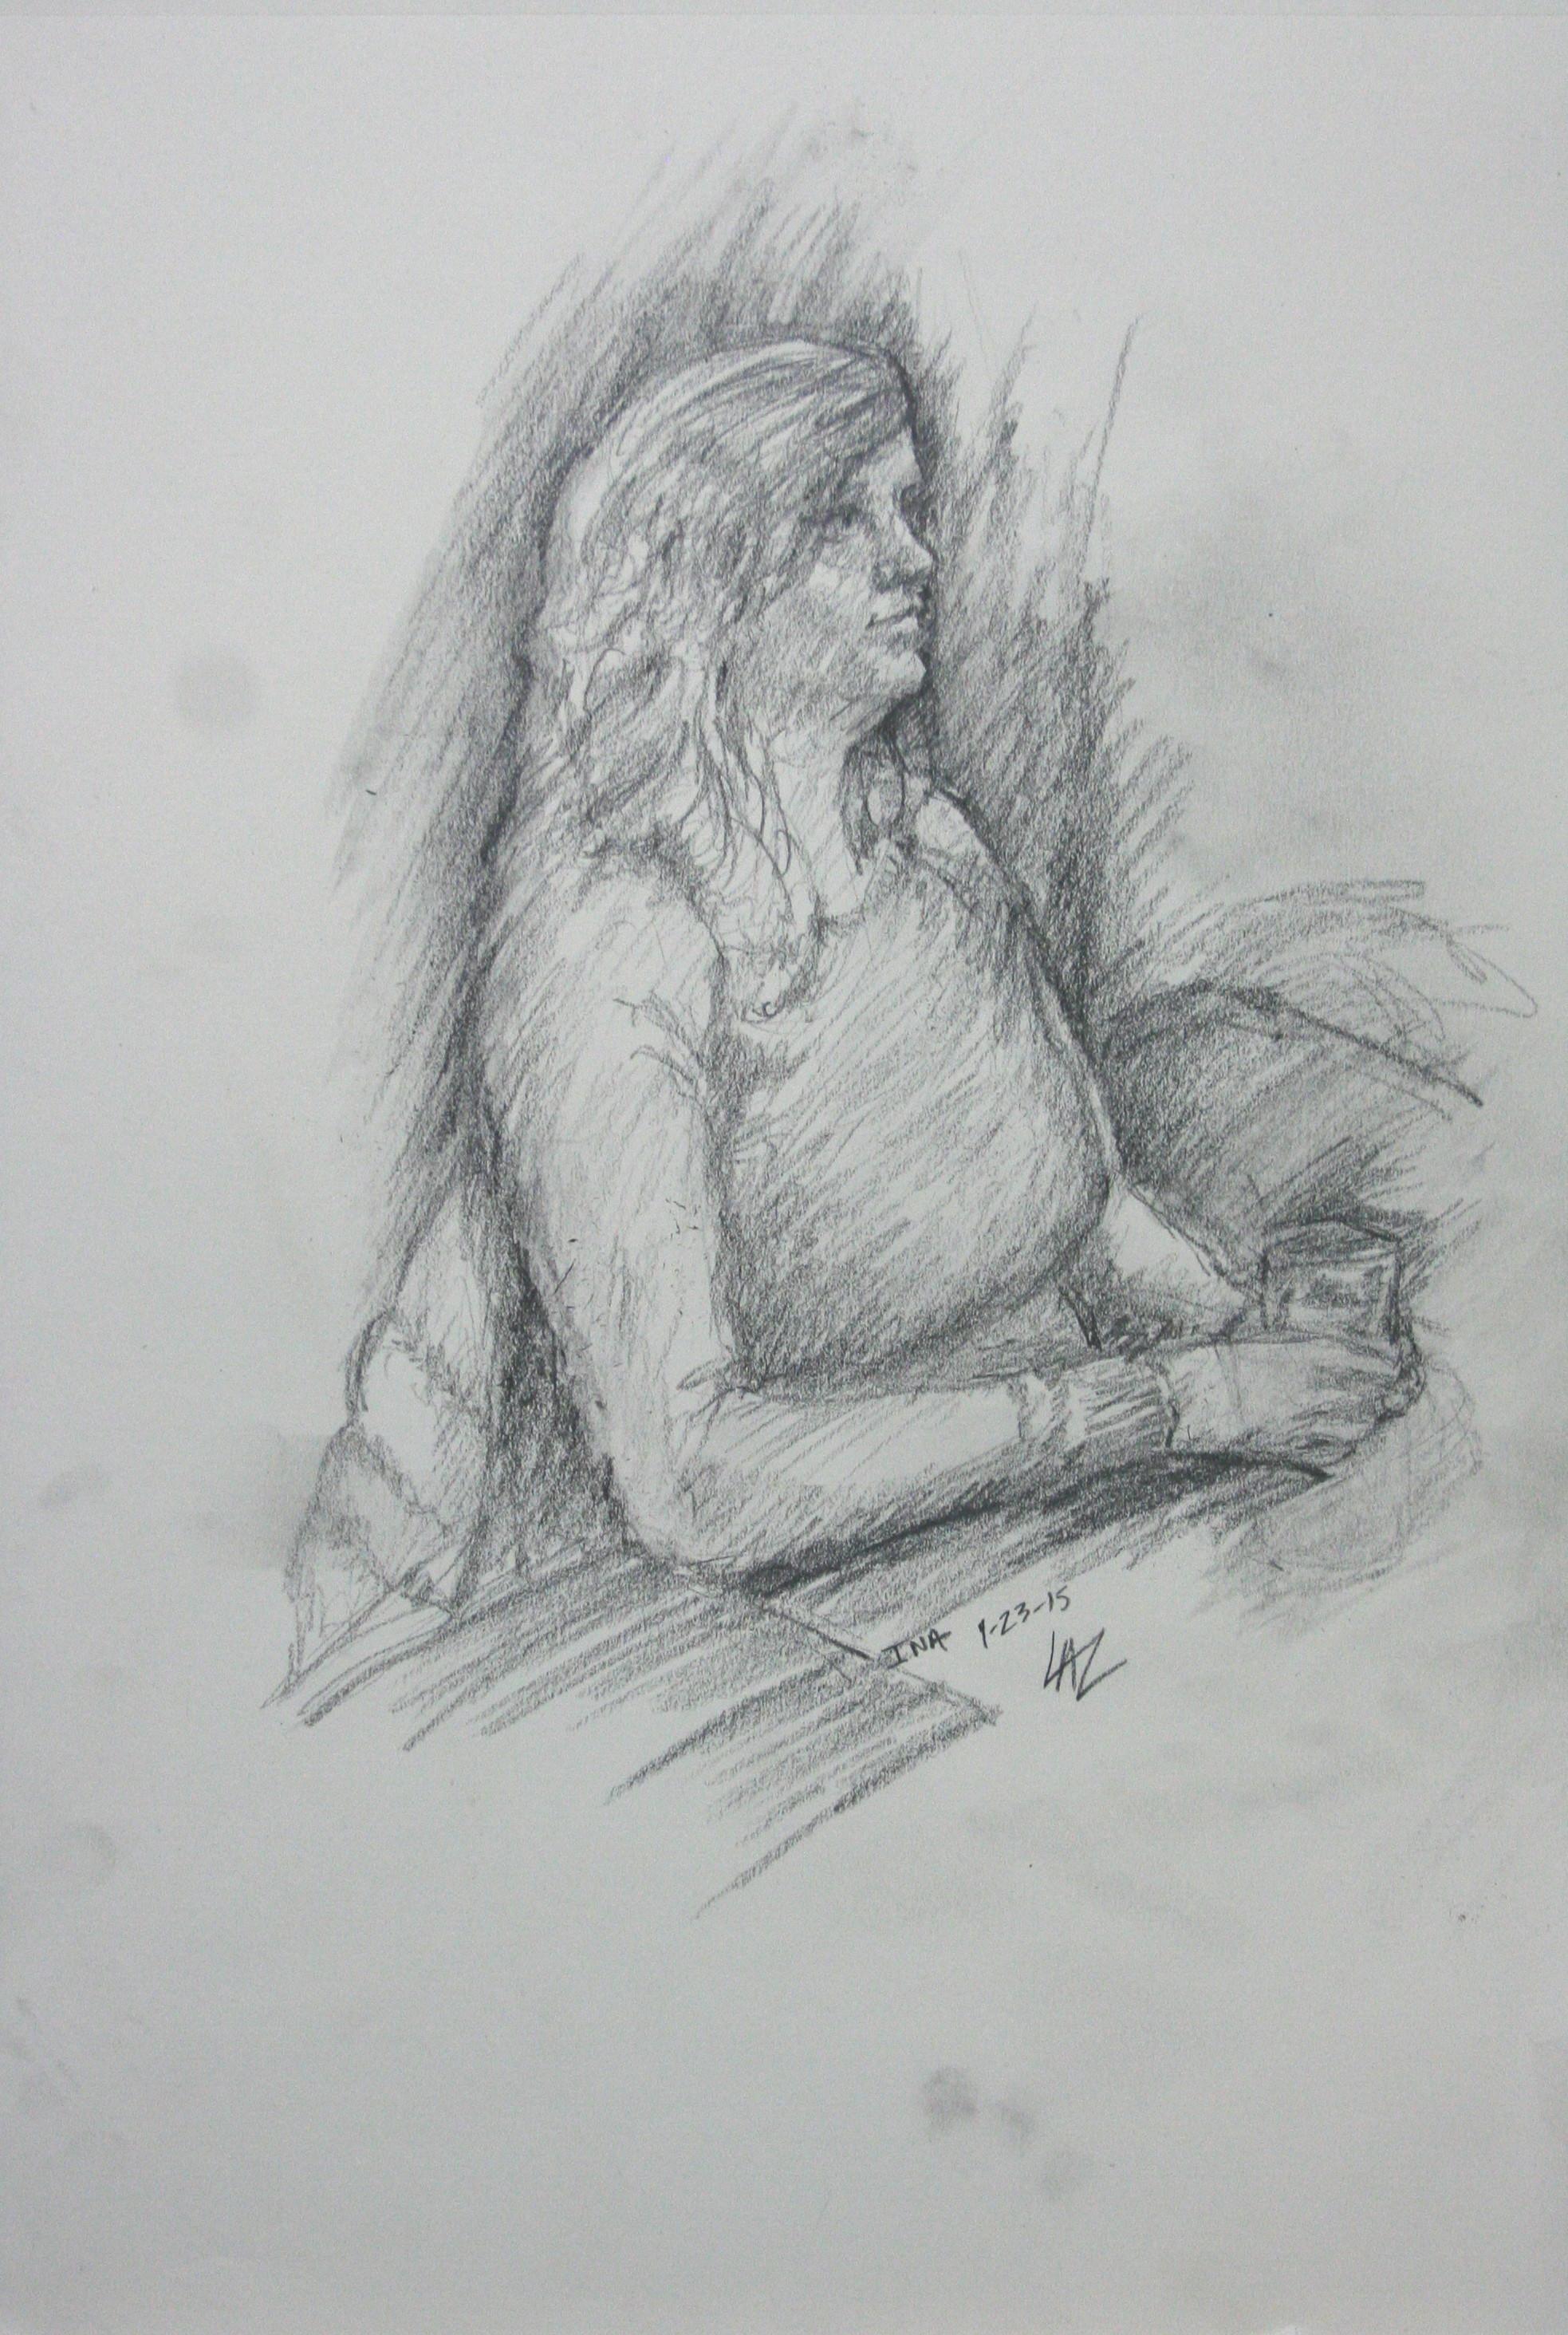 Laszlo Gyorki did this 3-hour drawing.